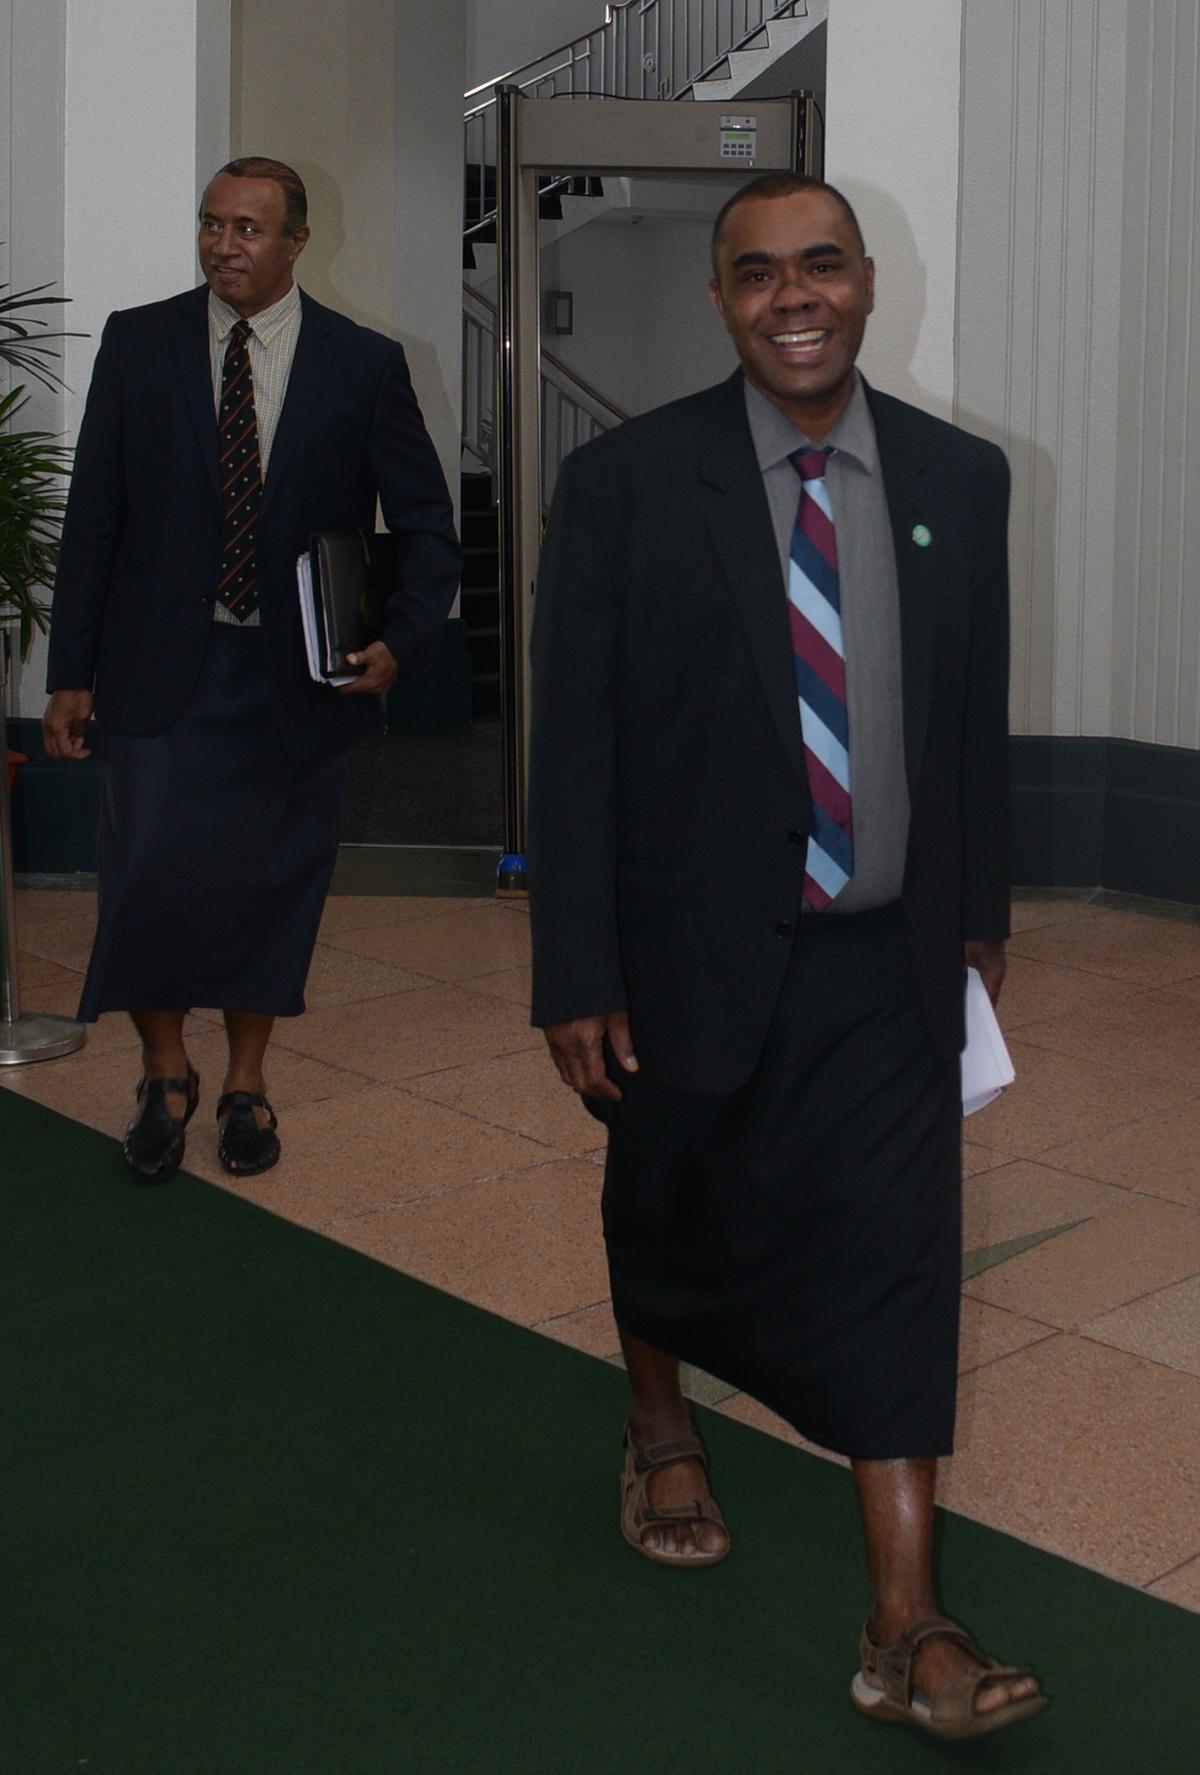 Member of opposition Mosese Bulitavu with Ro Filipe Tuisawau outside the parliament house on February 11,2019.Photo:Simione Haravanua.